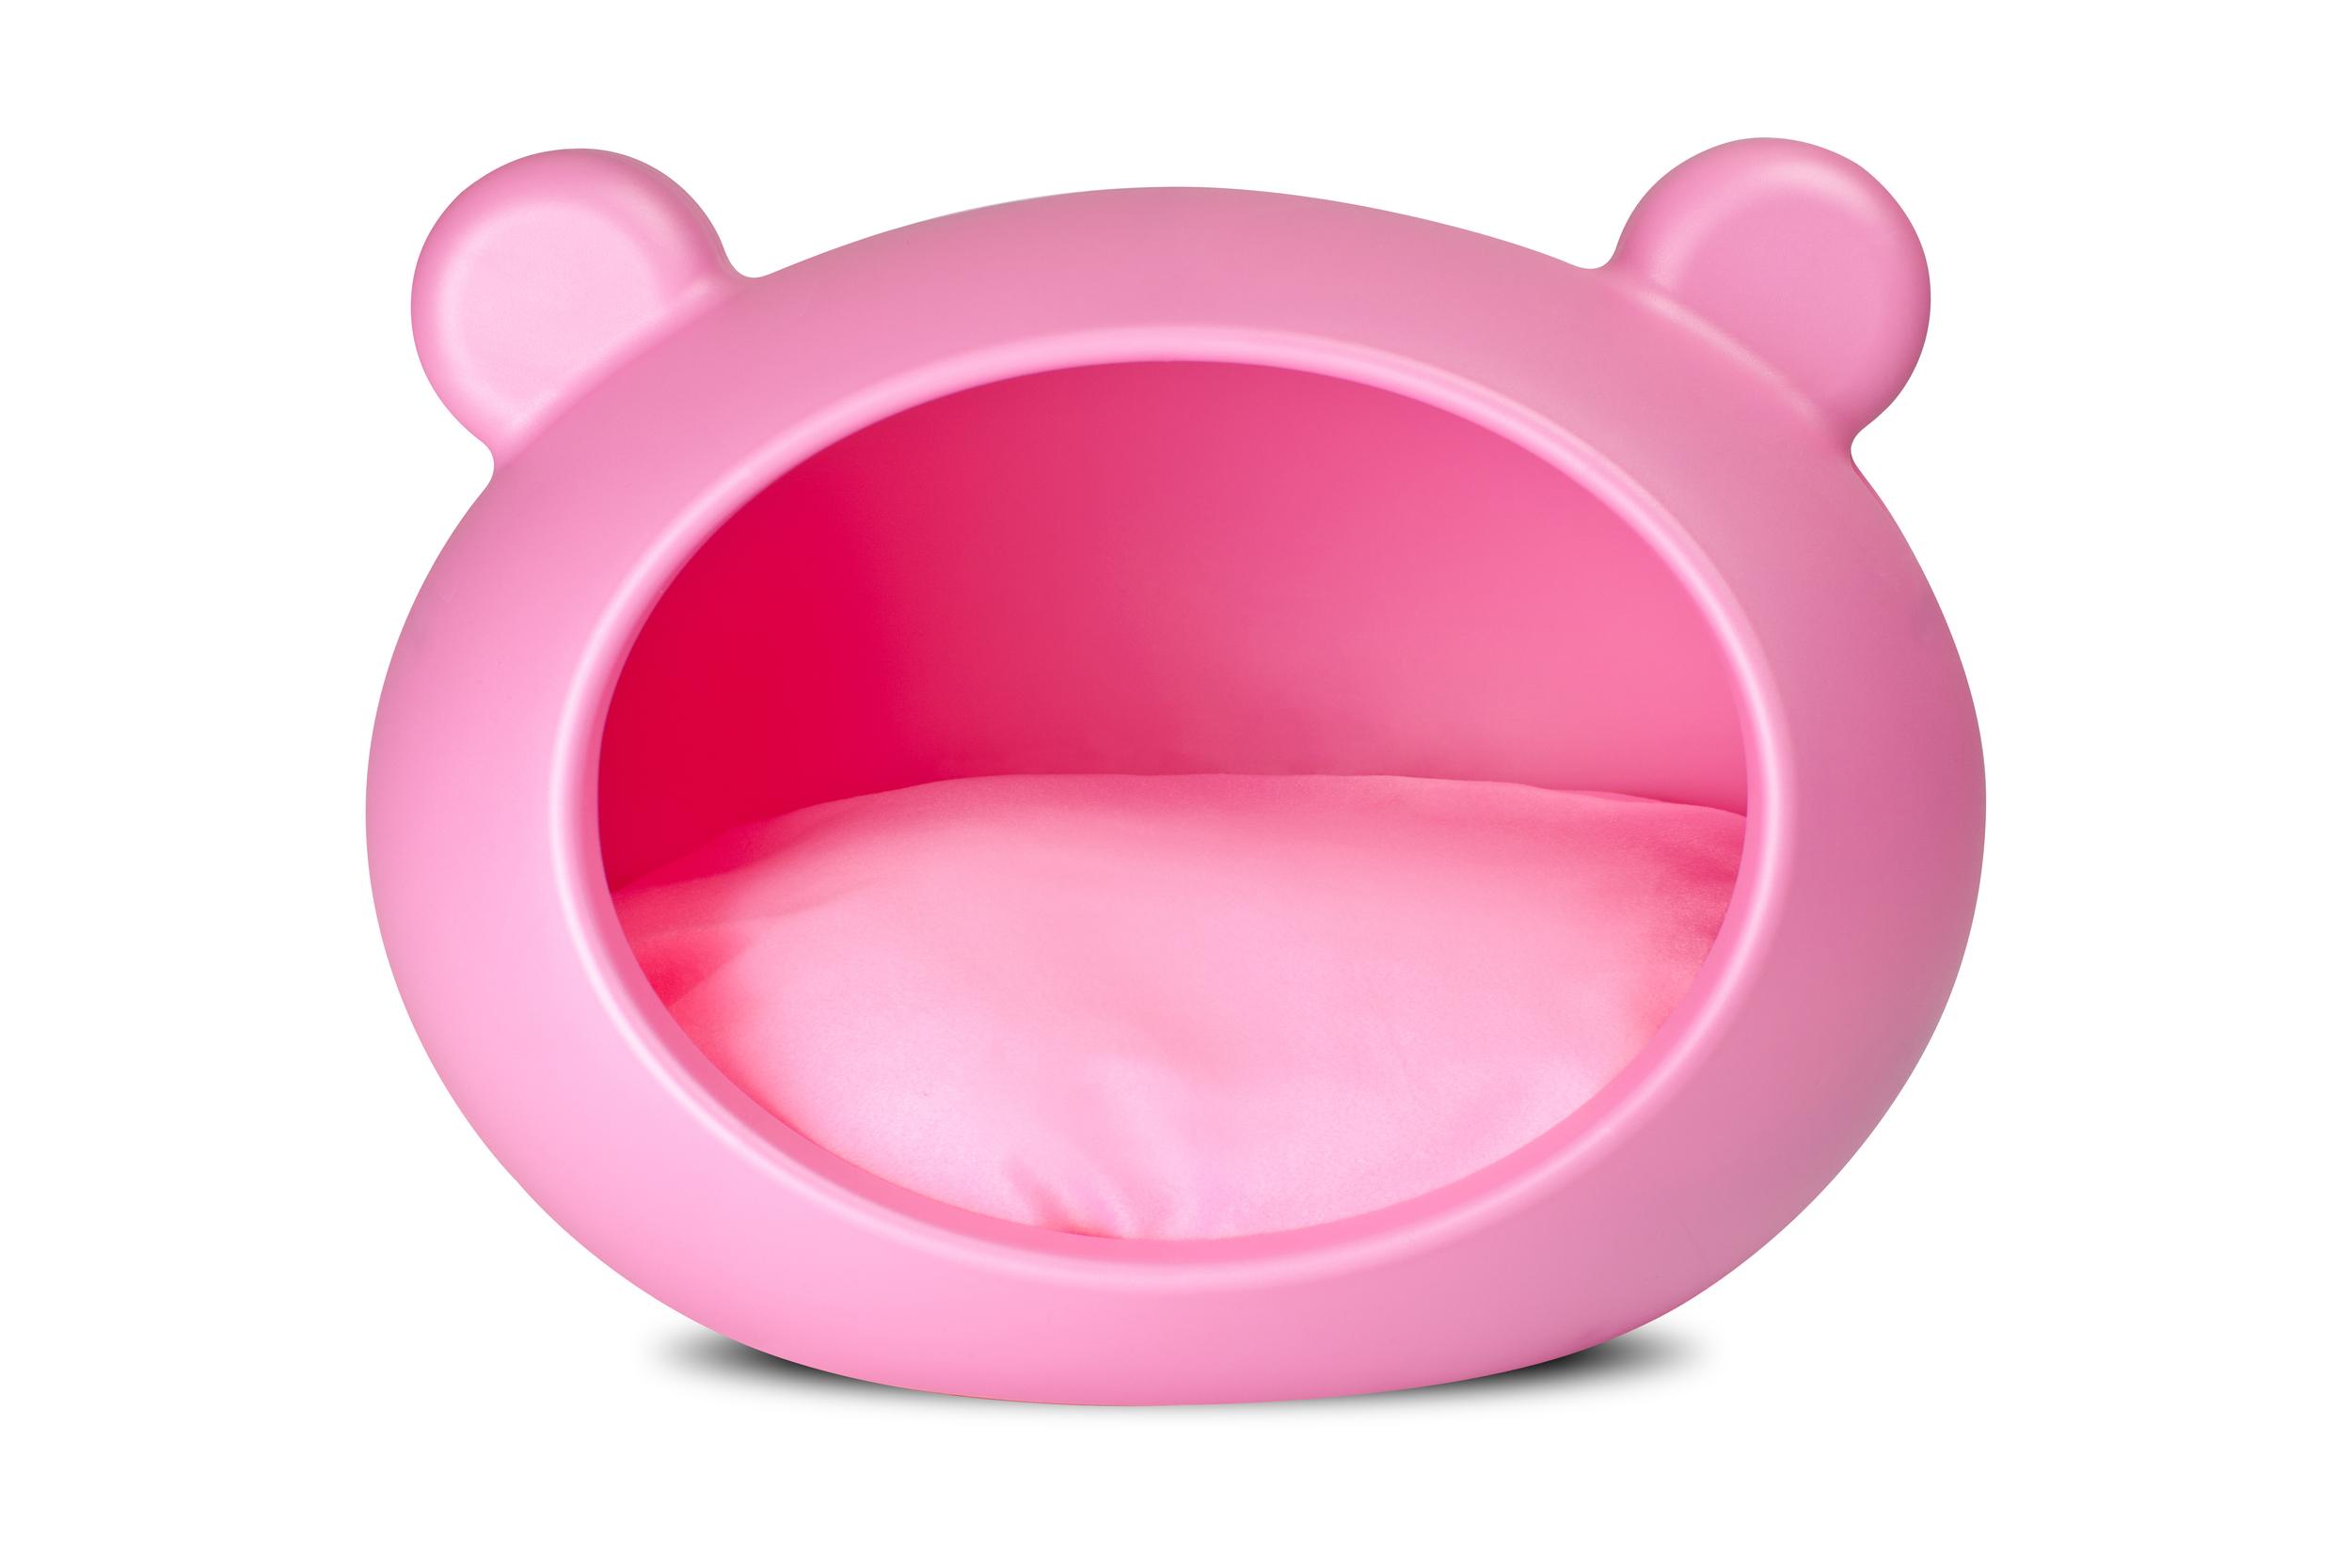 pink_dog_bed_pink_cushion.jpg